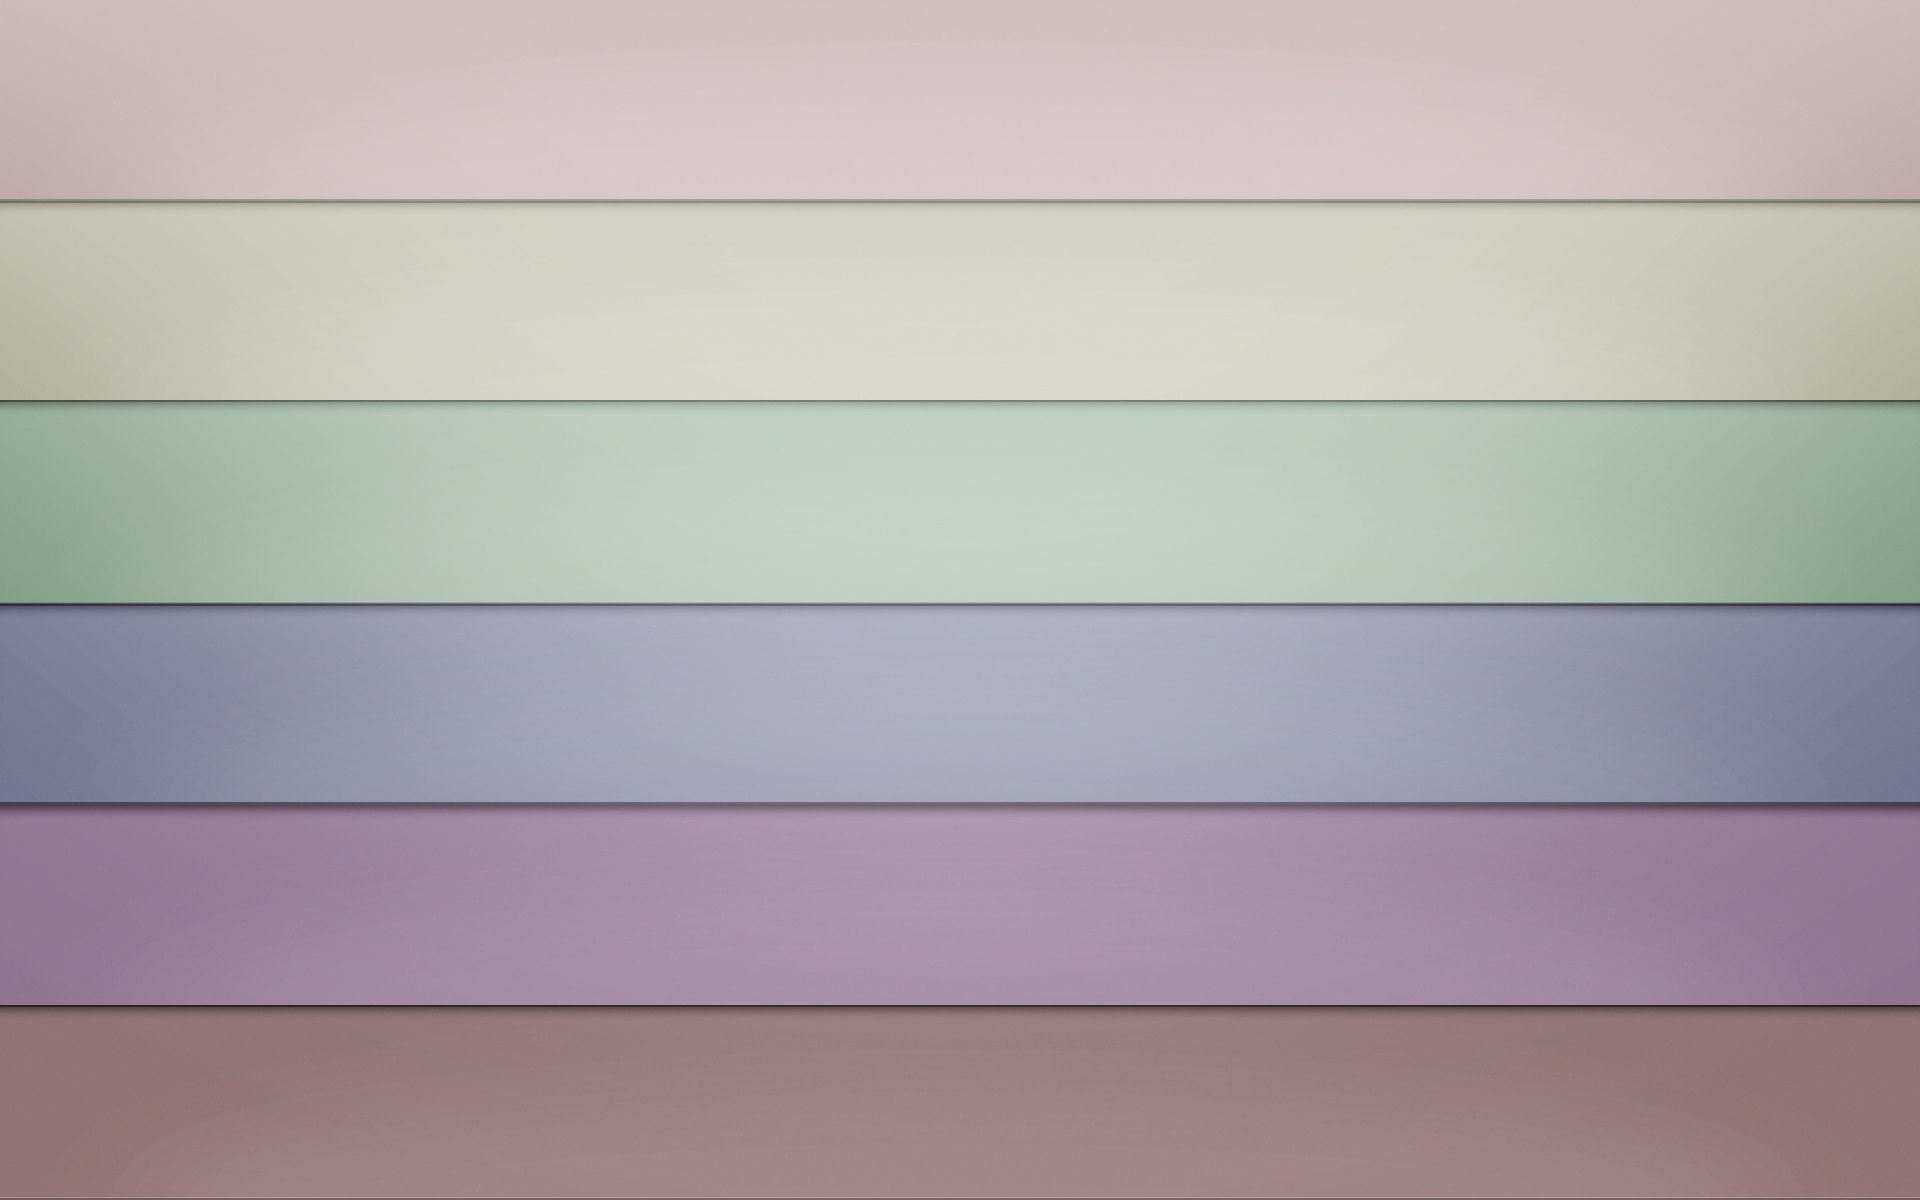 pastel-wallpaper-colores-retro-minimalista-image-71222.jpg (1920×1200)